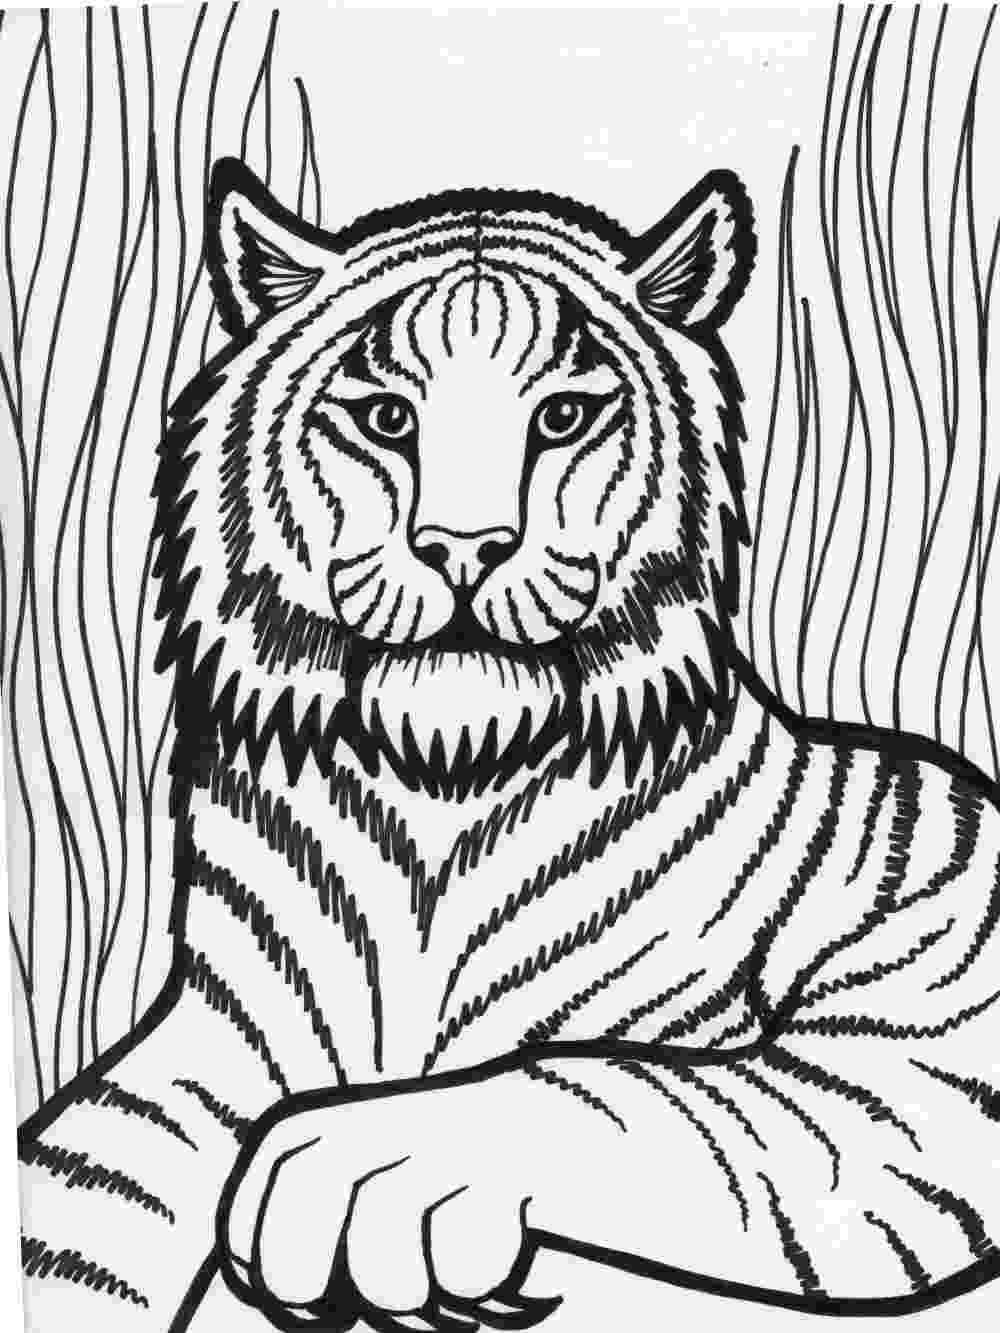 coloring page tiger free printable tiger coloring pages for kids page tiger coloring